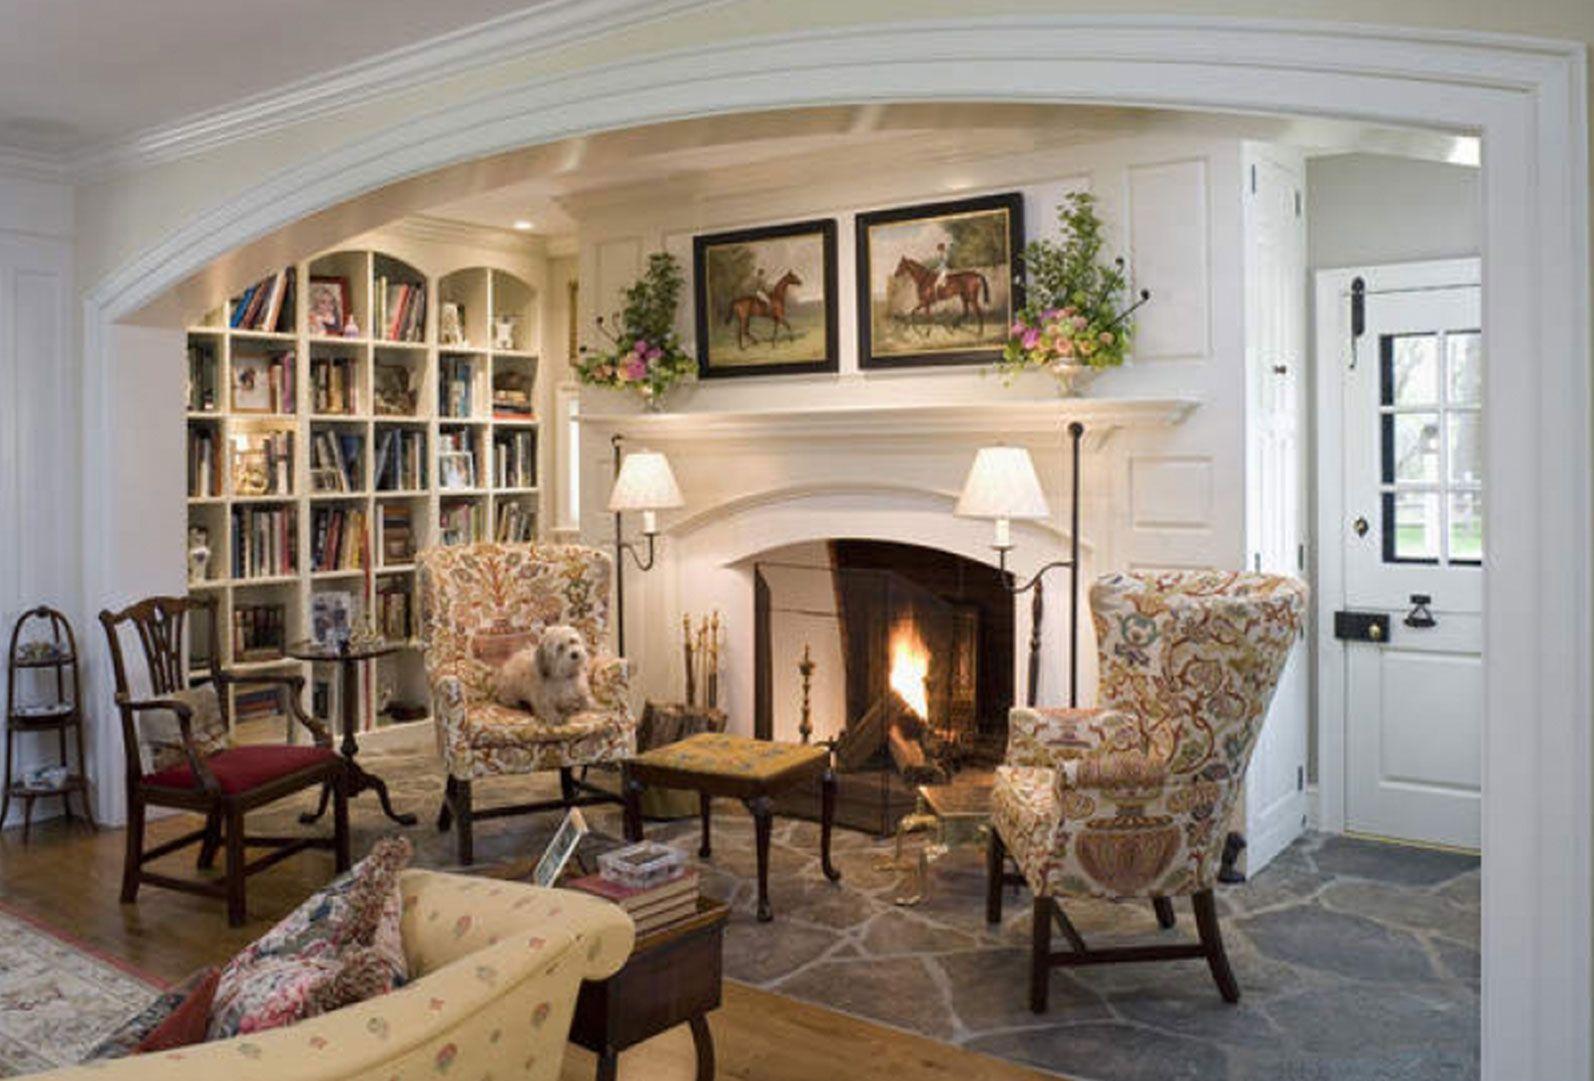 Cozy Interior Home Design Wallpaper